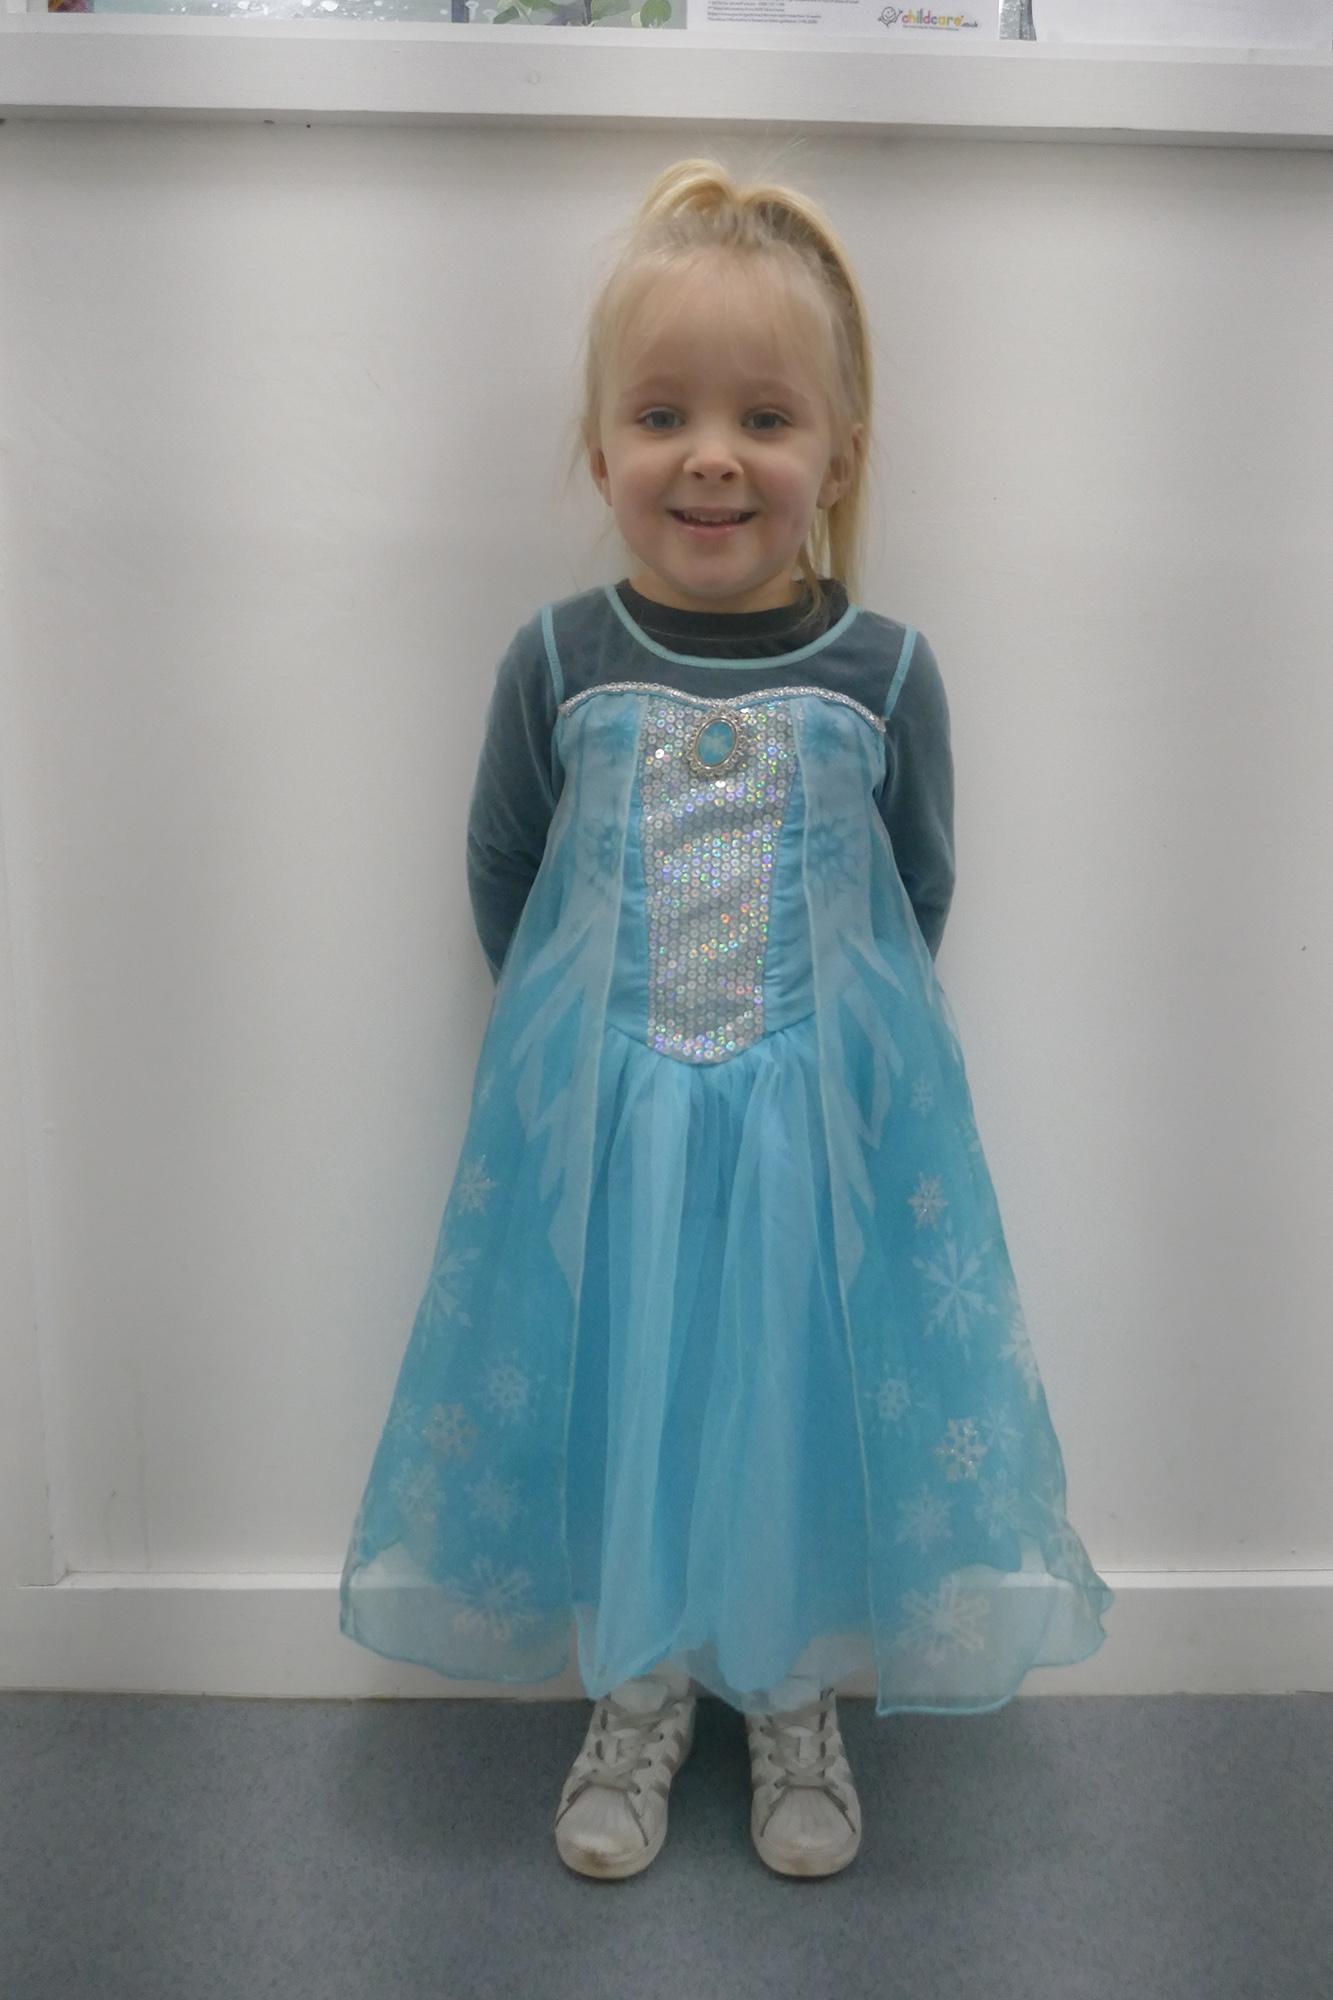 Child dressed as Elsa